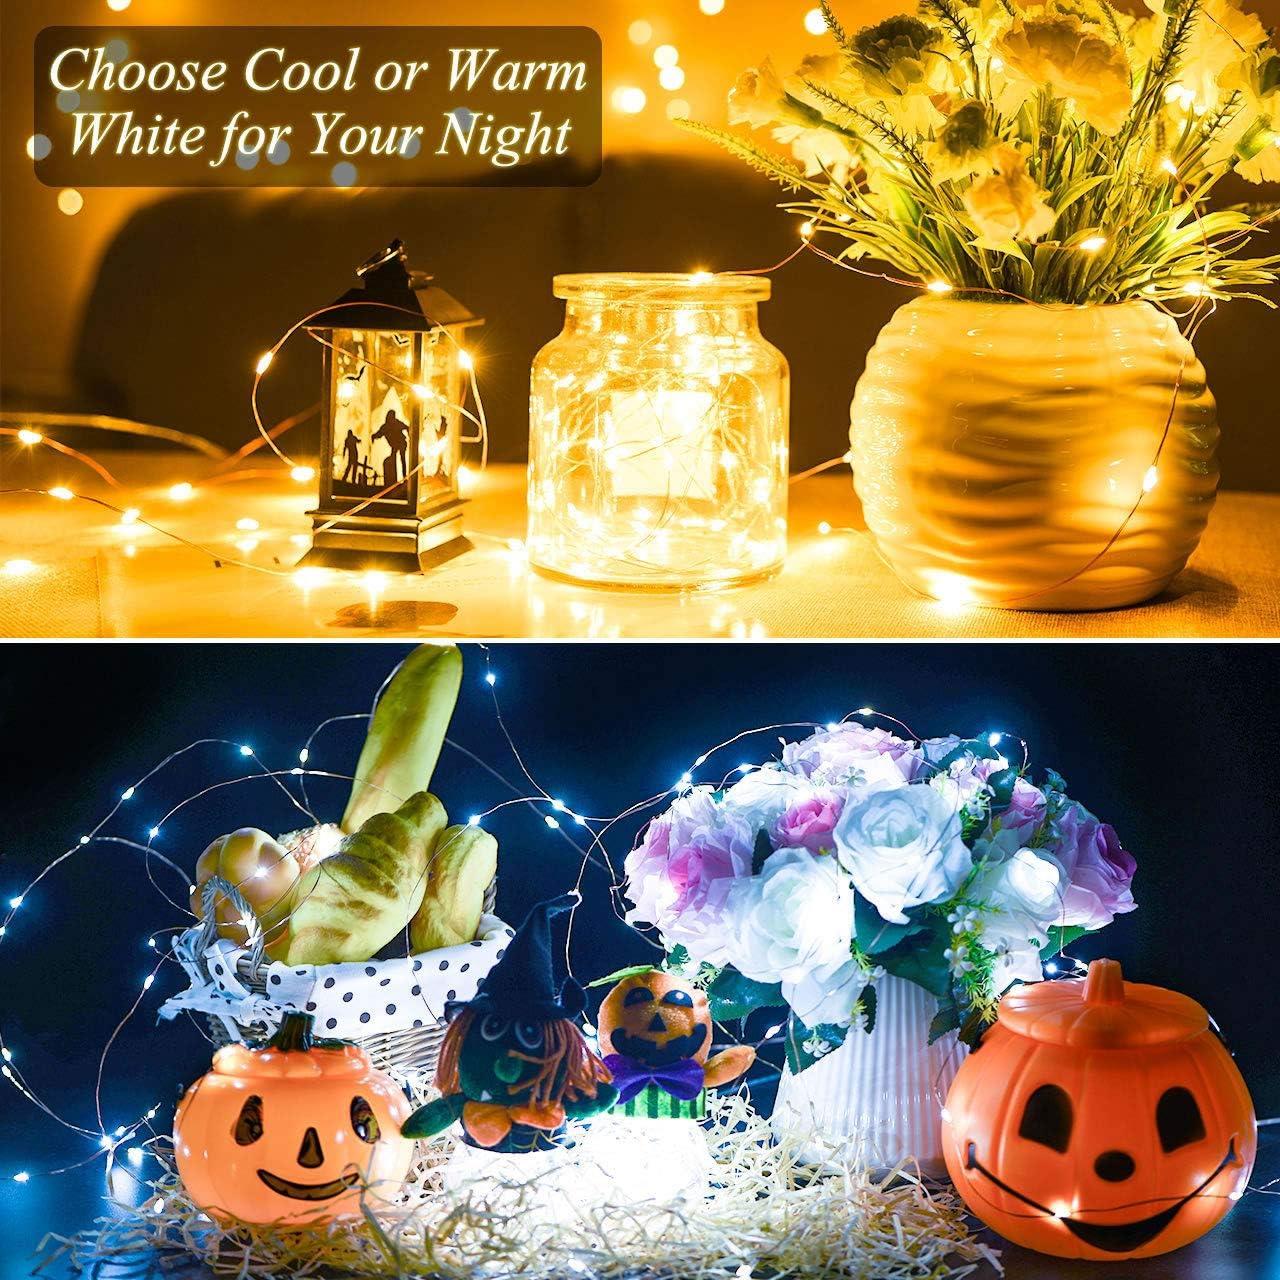 Mpow 33ft String Lights 燈串(2Pcs), 派對/節日裝飾,溫馨有氛圍